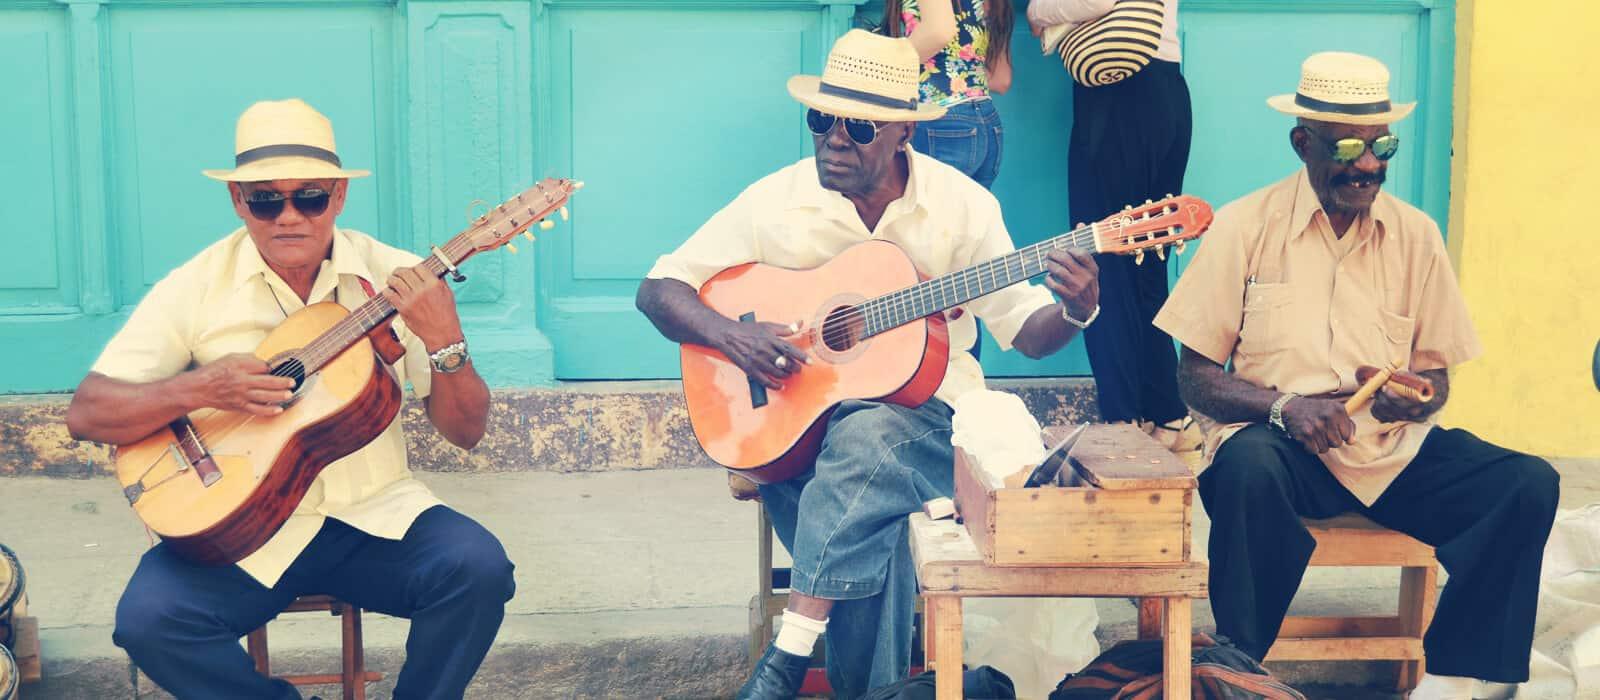 musicos cubanos tocando en las calles